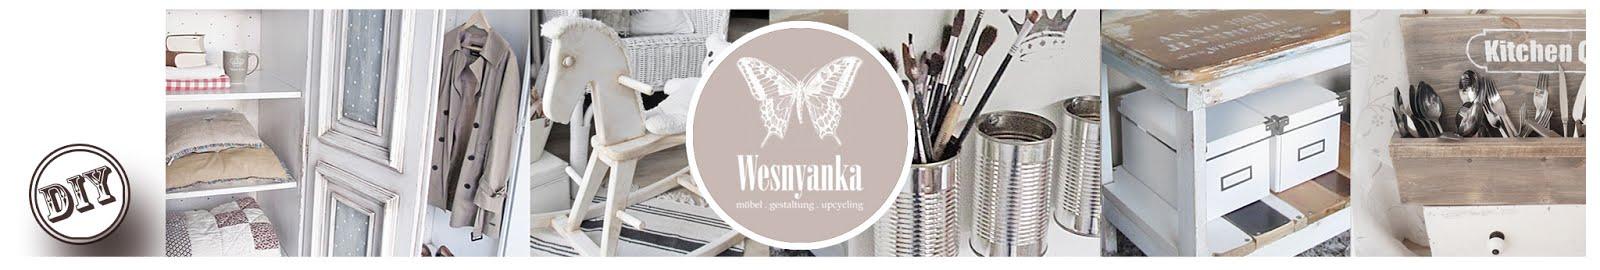 Wesnyanka